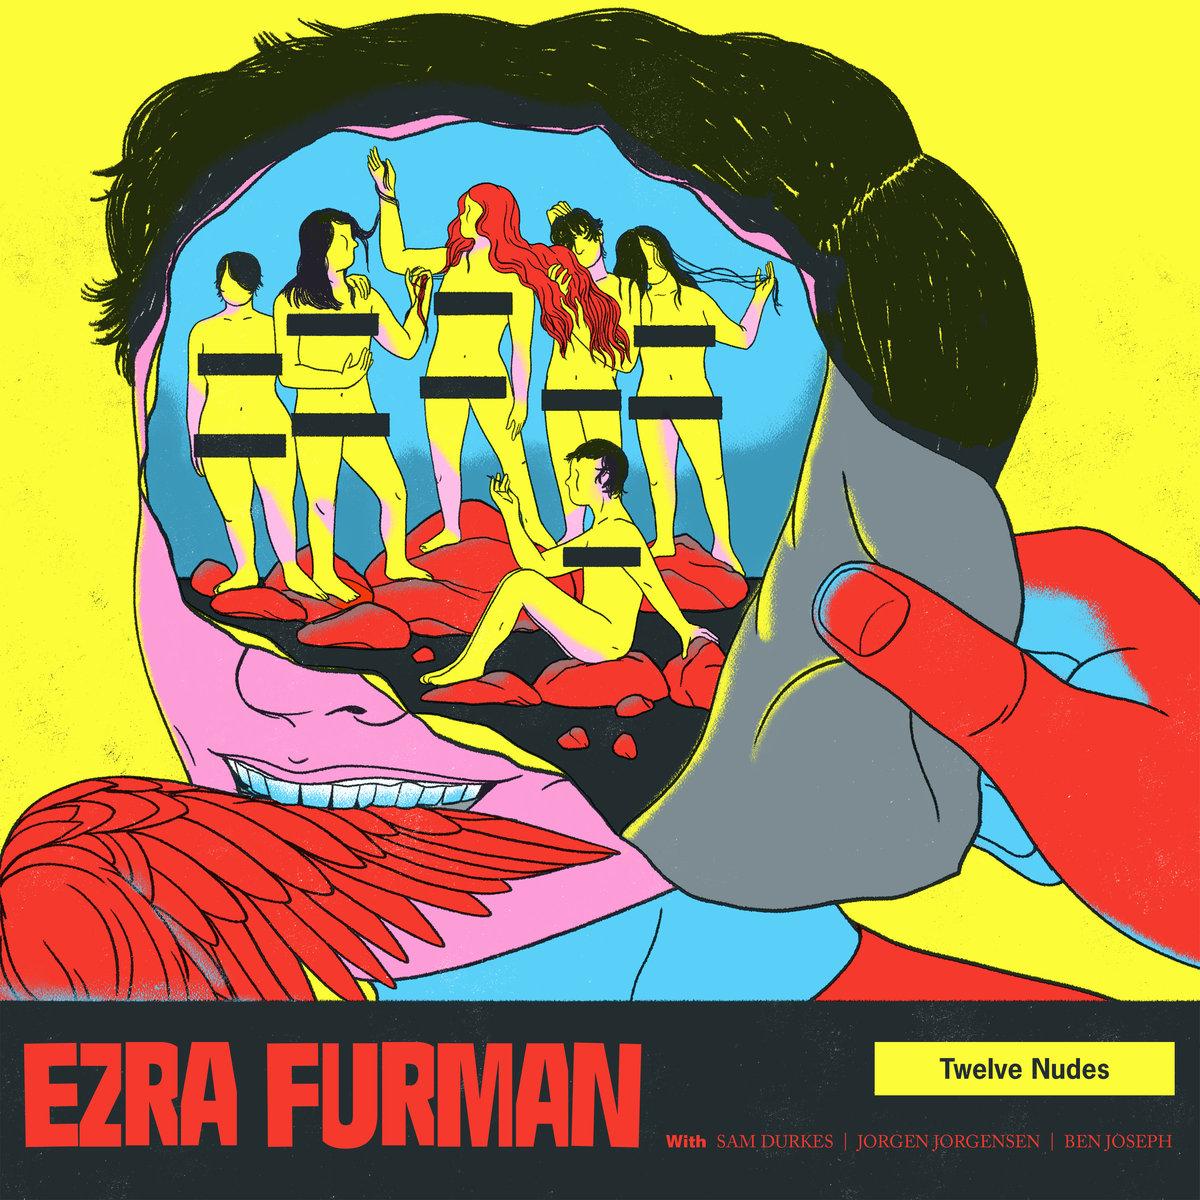 new ezra furman album cover